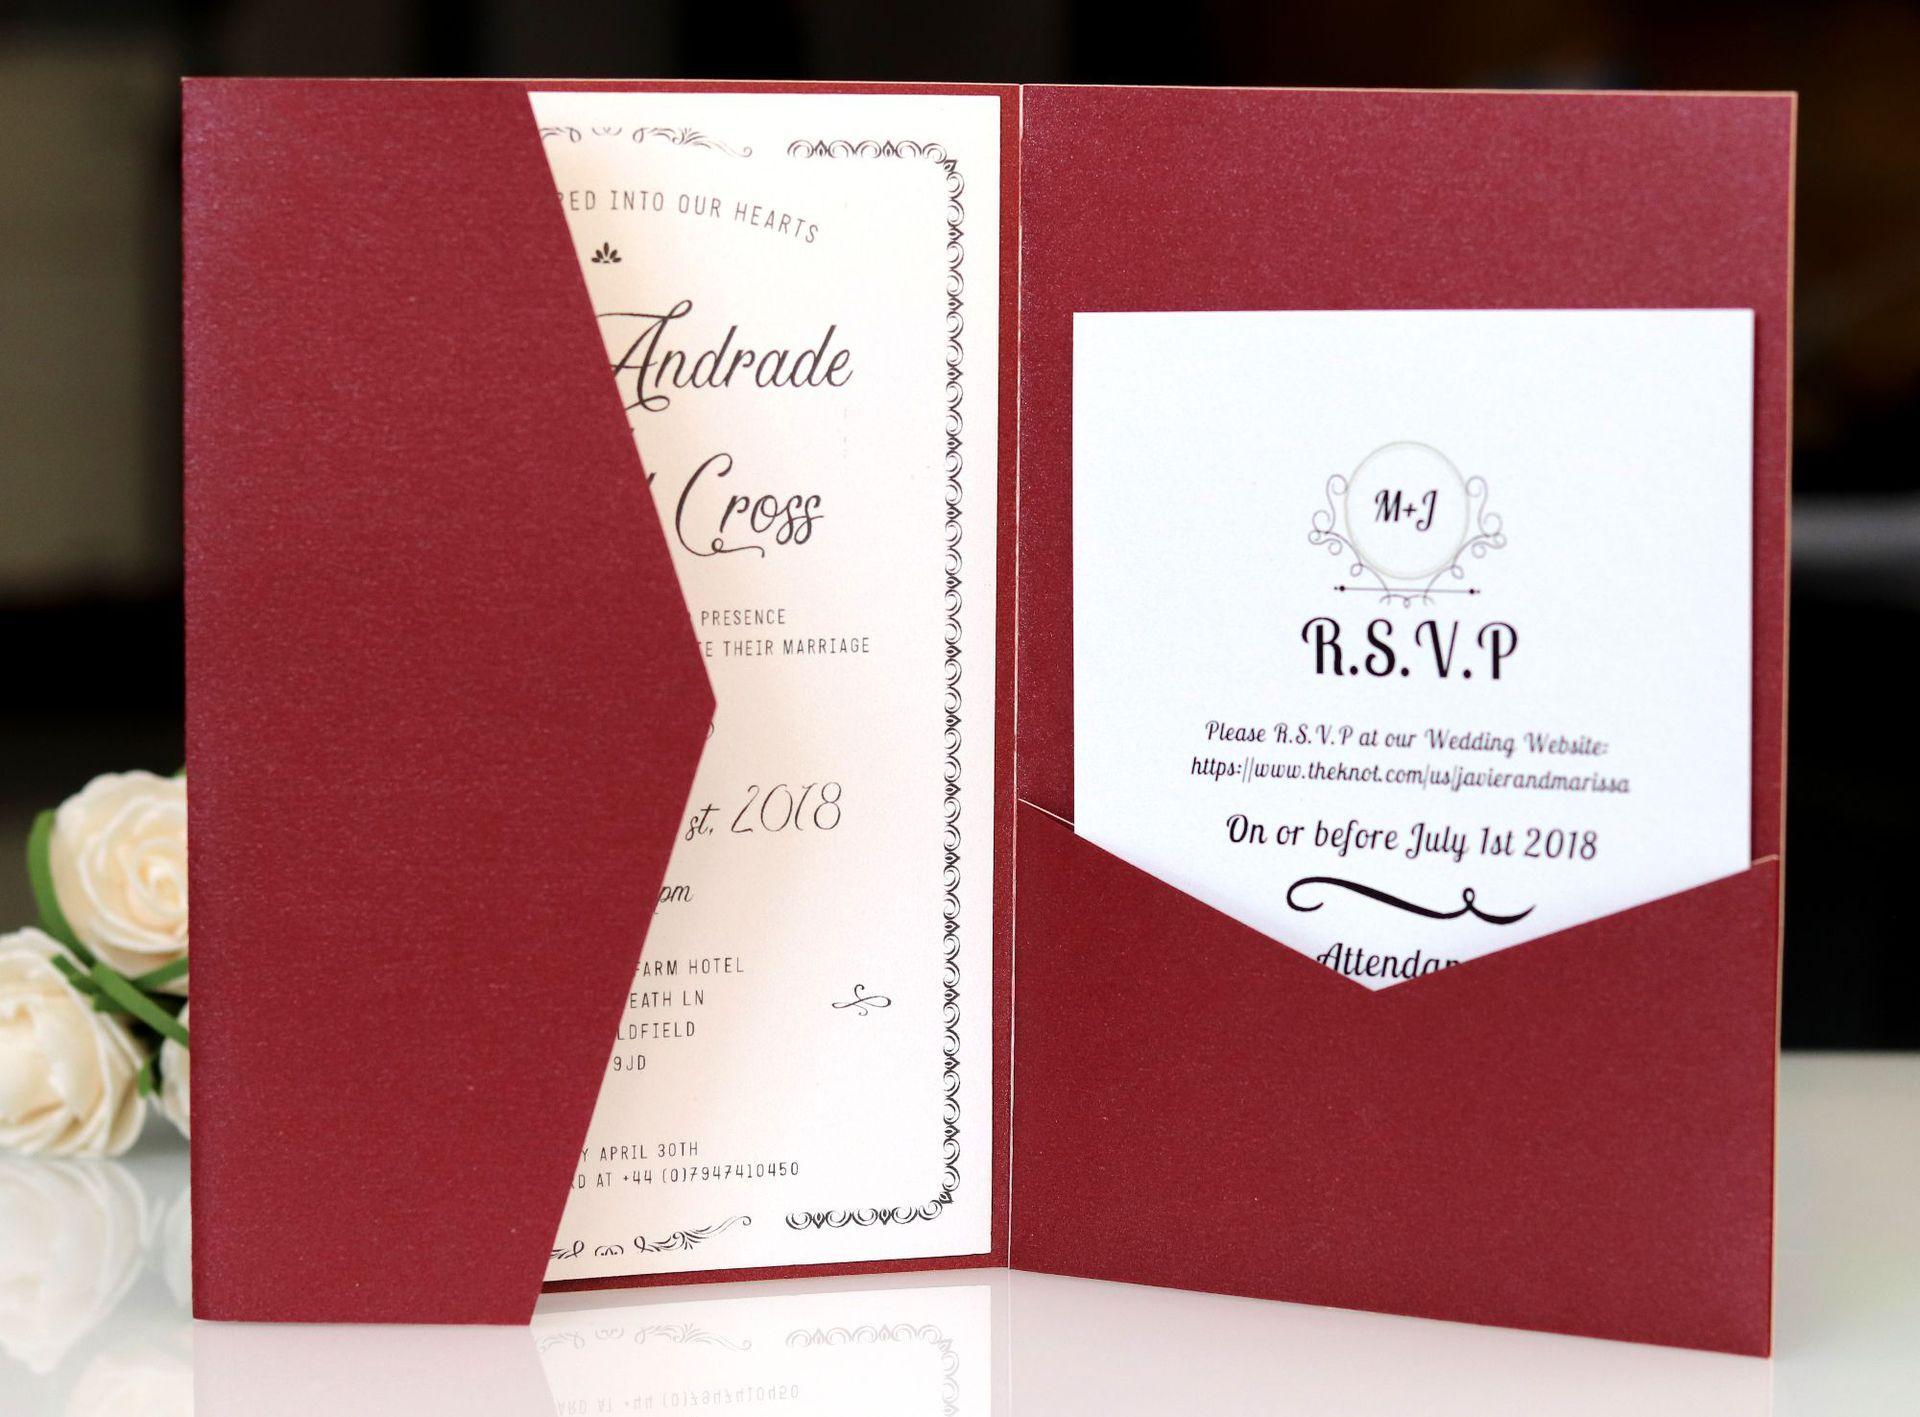 linda blog rsvp full form in invitation card